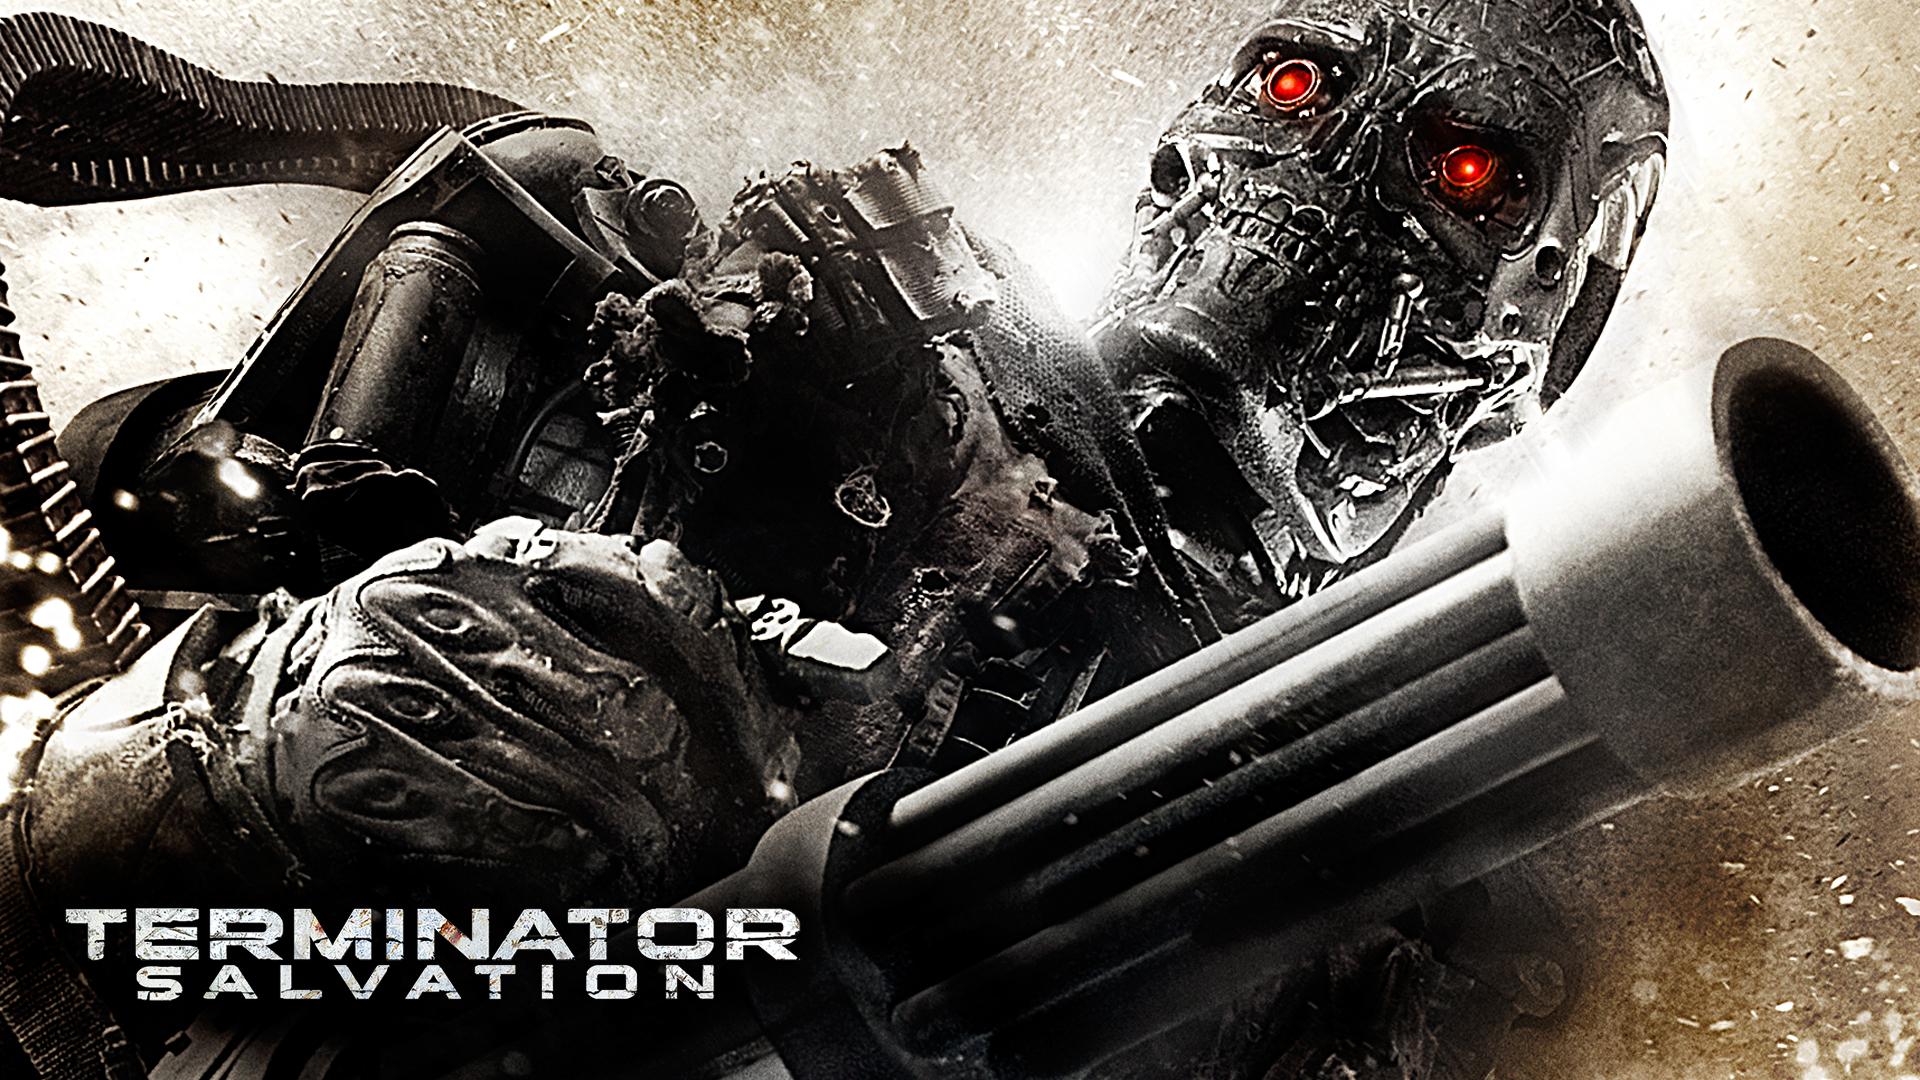 terminator salvation desktop wallpaper Wallpapers on desktop wallpaper movies, bullets, robot, terminator, salvation,  ammunition to download.